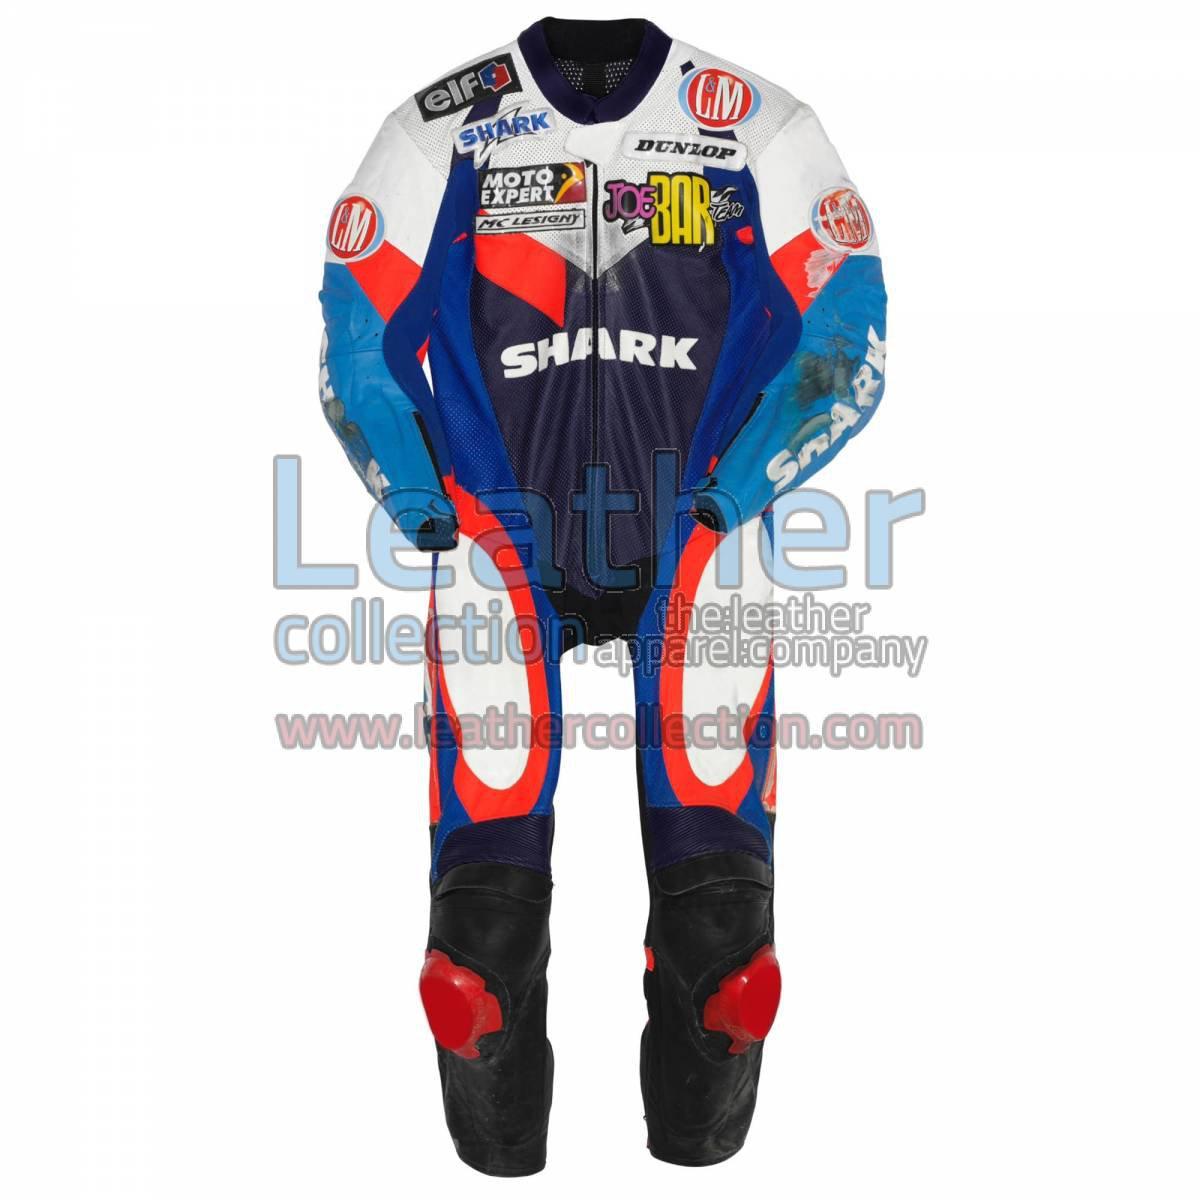 Randi De Puniet Aprilia GP 1999 Leather Suit